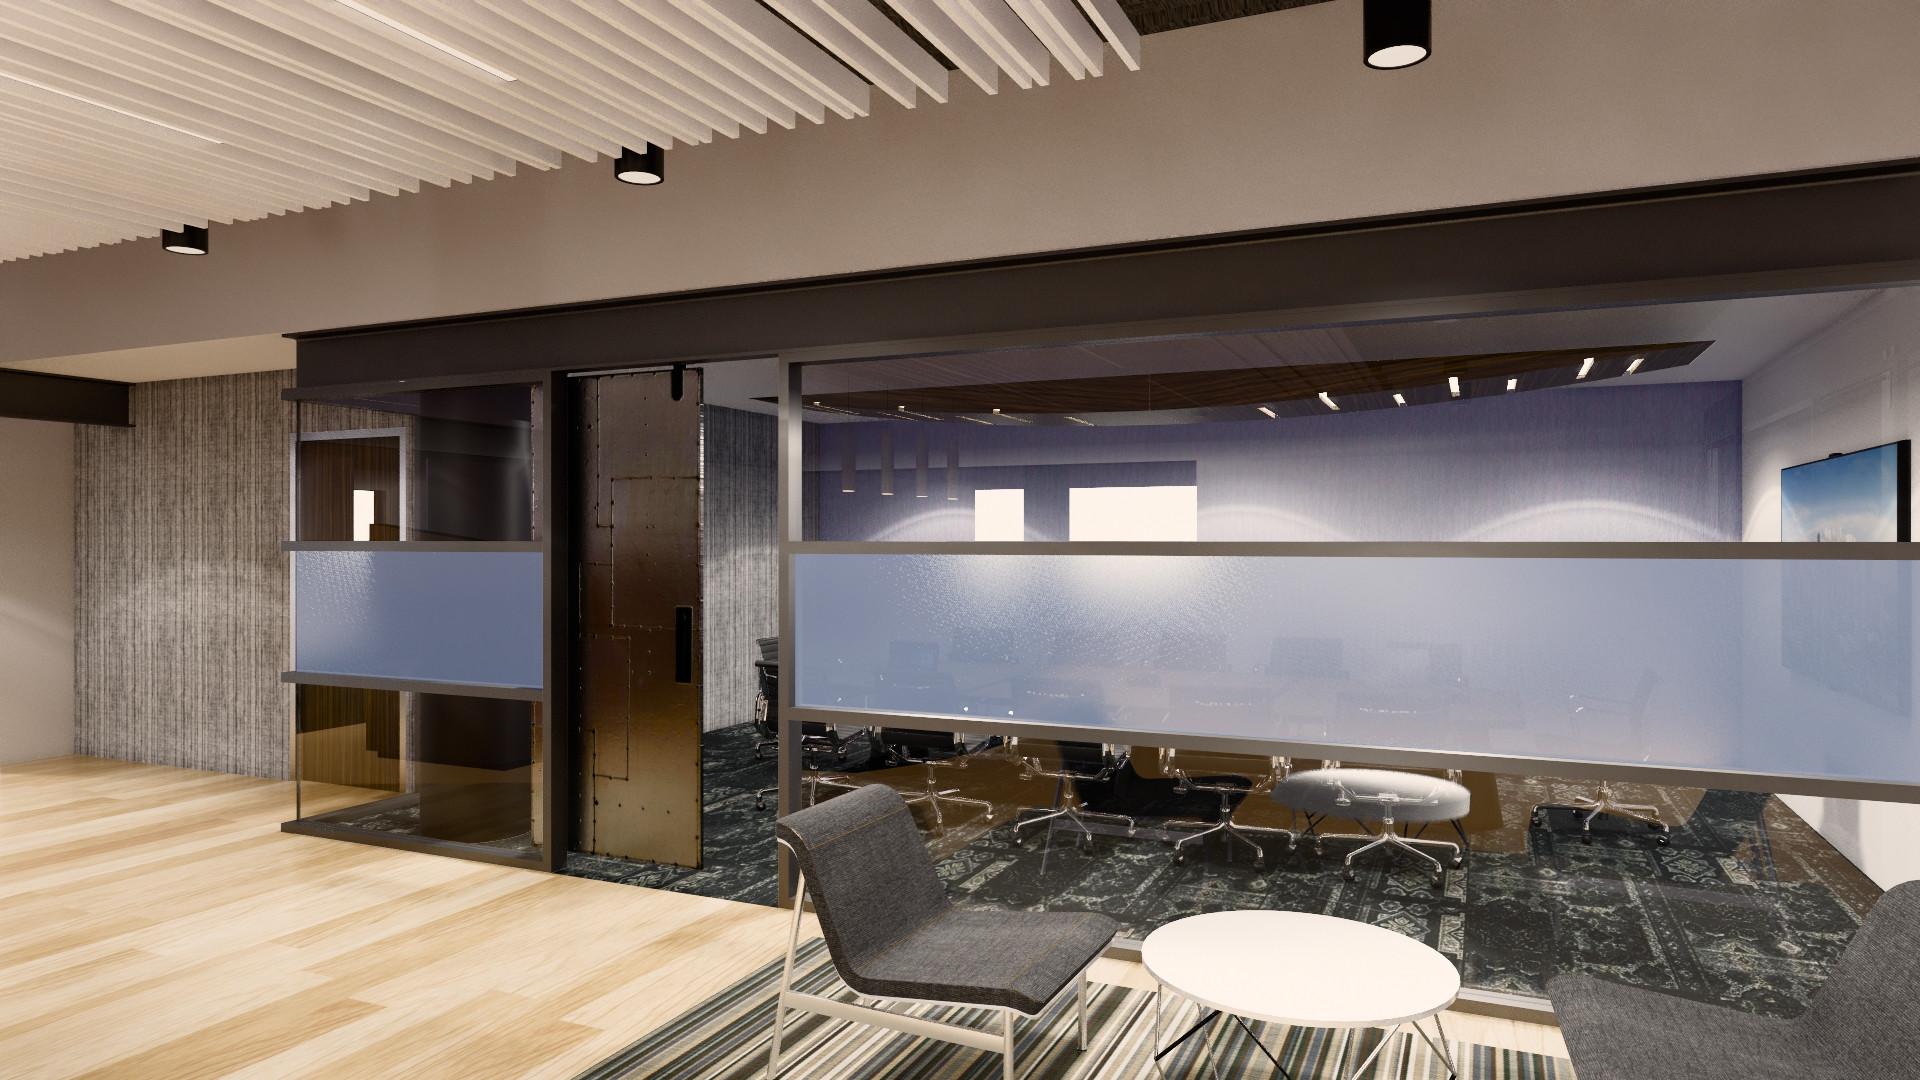 BOILERMAKER Office Renovation - Proposed